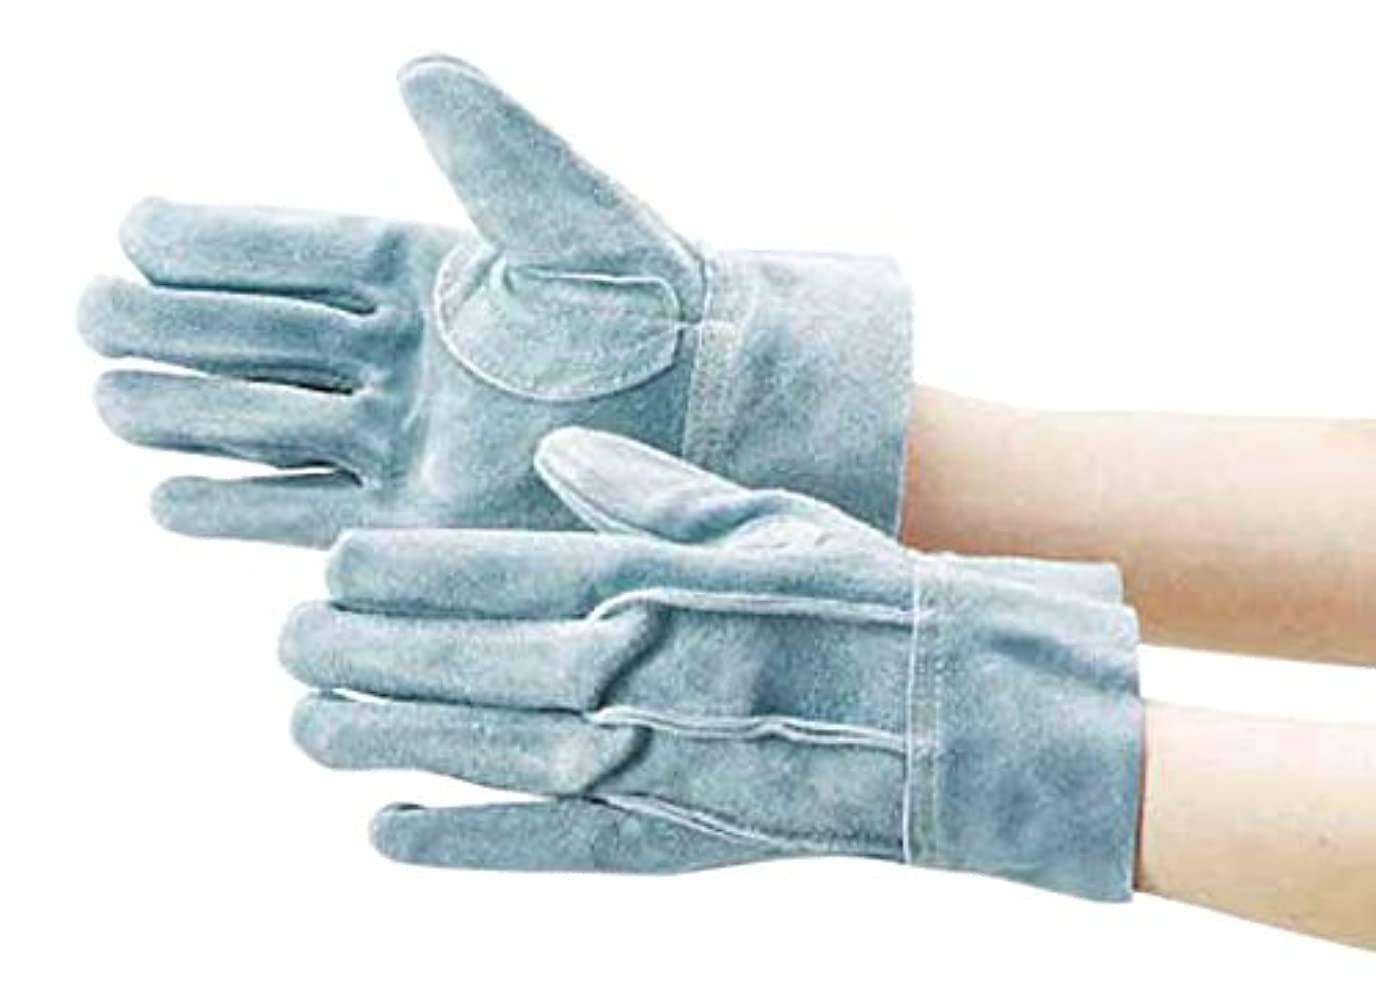 TRUSCO(トラスコ) オイル加工革手袋 スタンダードタイプ LLサイズ TYK-107APW-LL